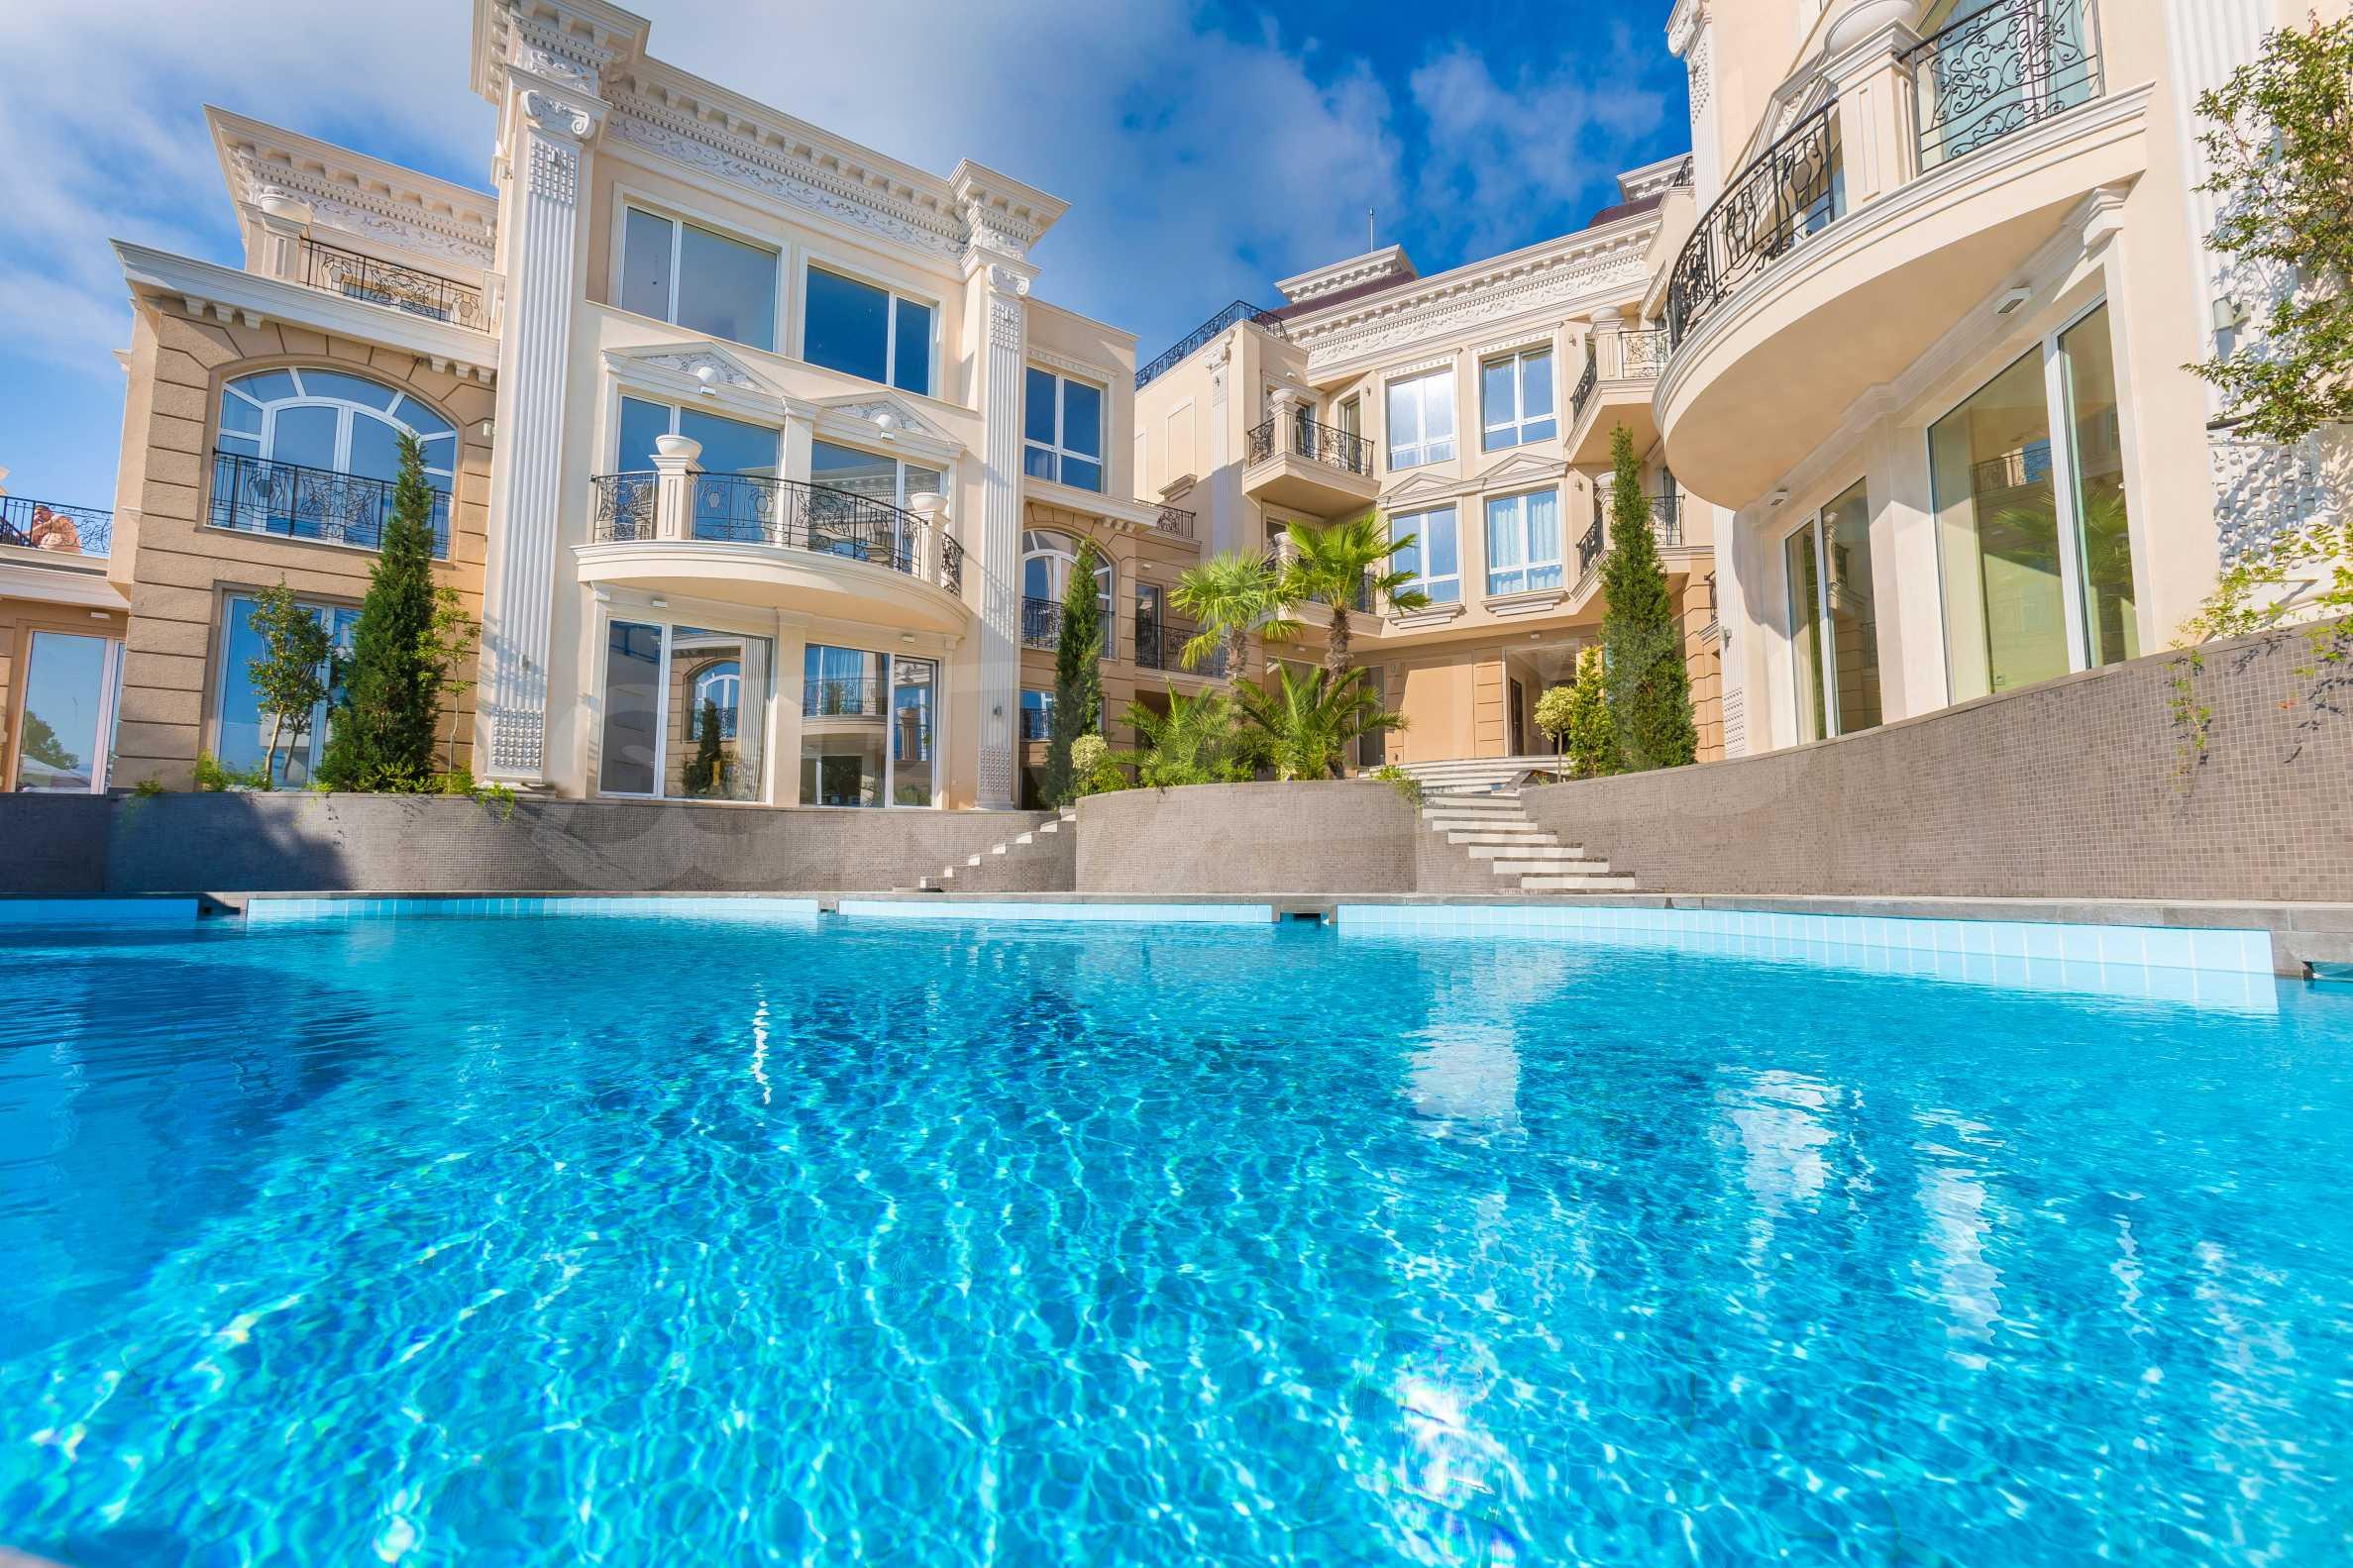 Дизайнерски тристаен апартамент под наем за летен сезон в резиденция Belle Époque в Лозенец 37